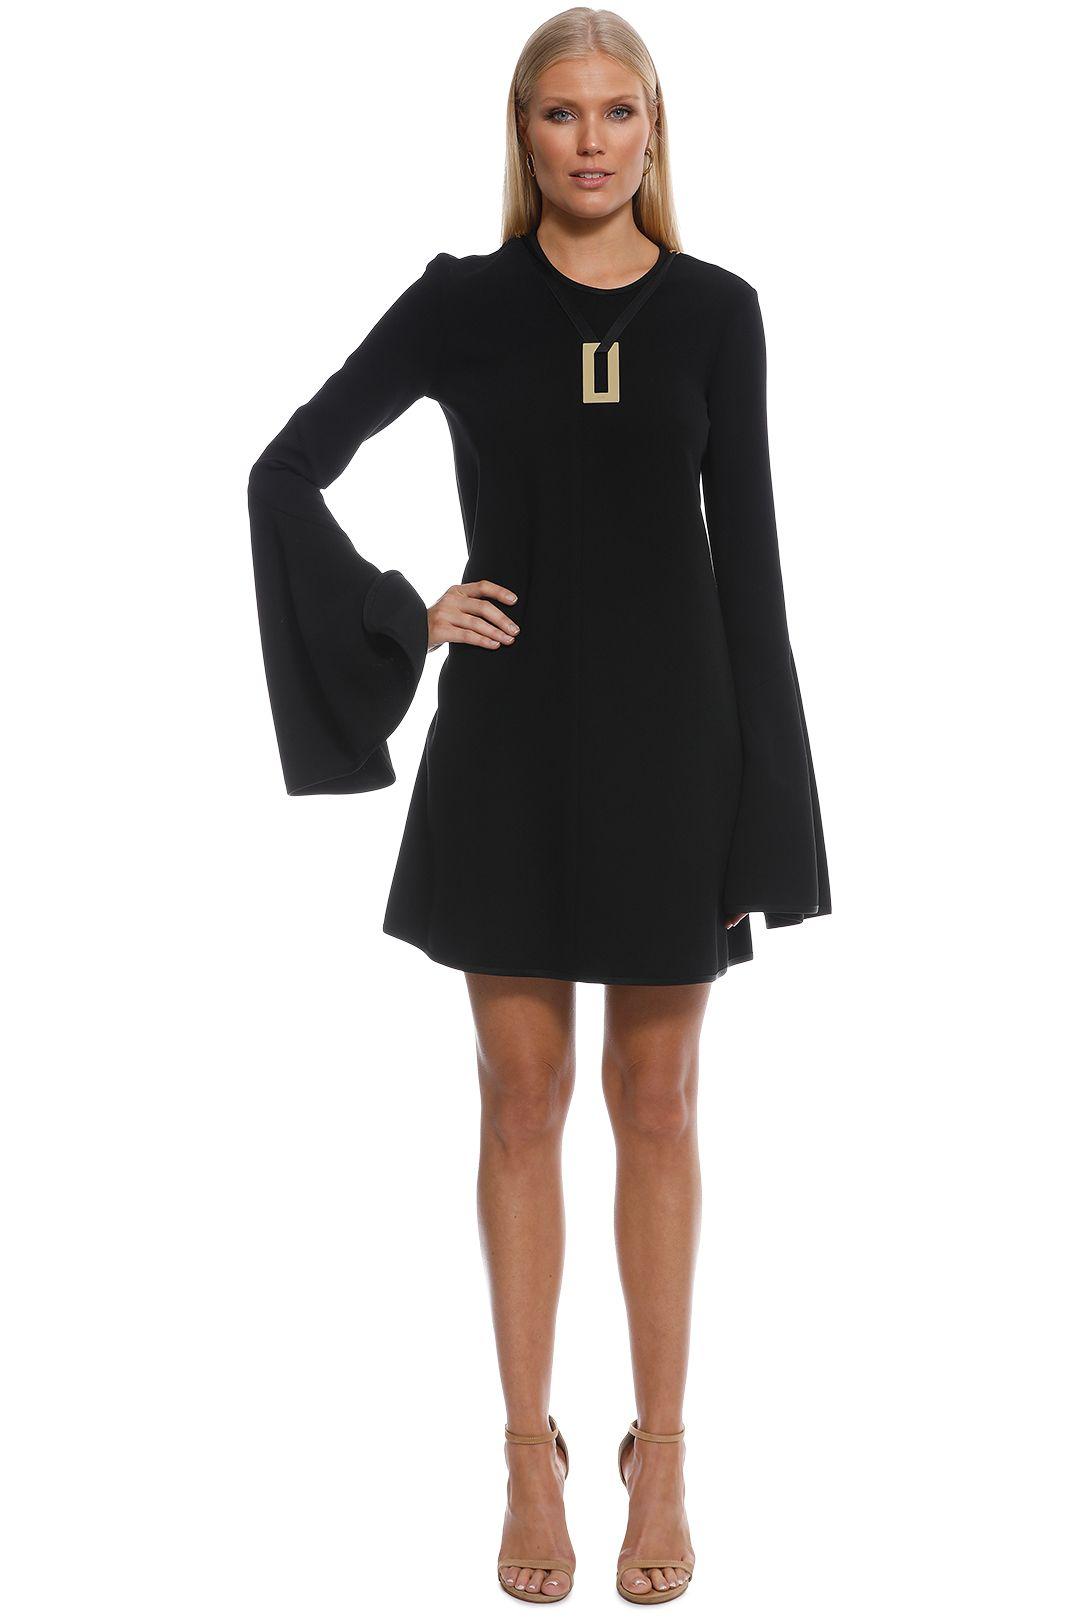 Ellery - Preacher Mini Dress - Black - Front